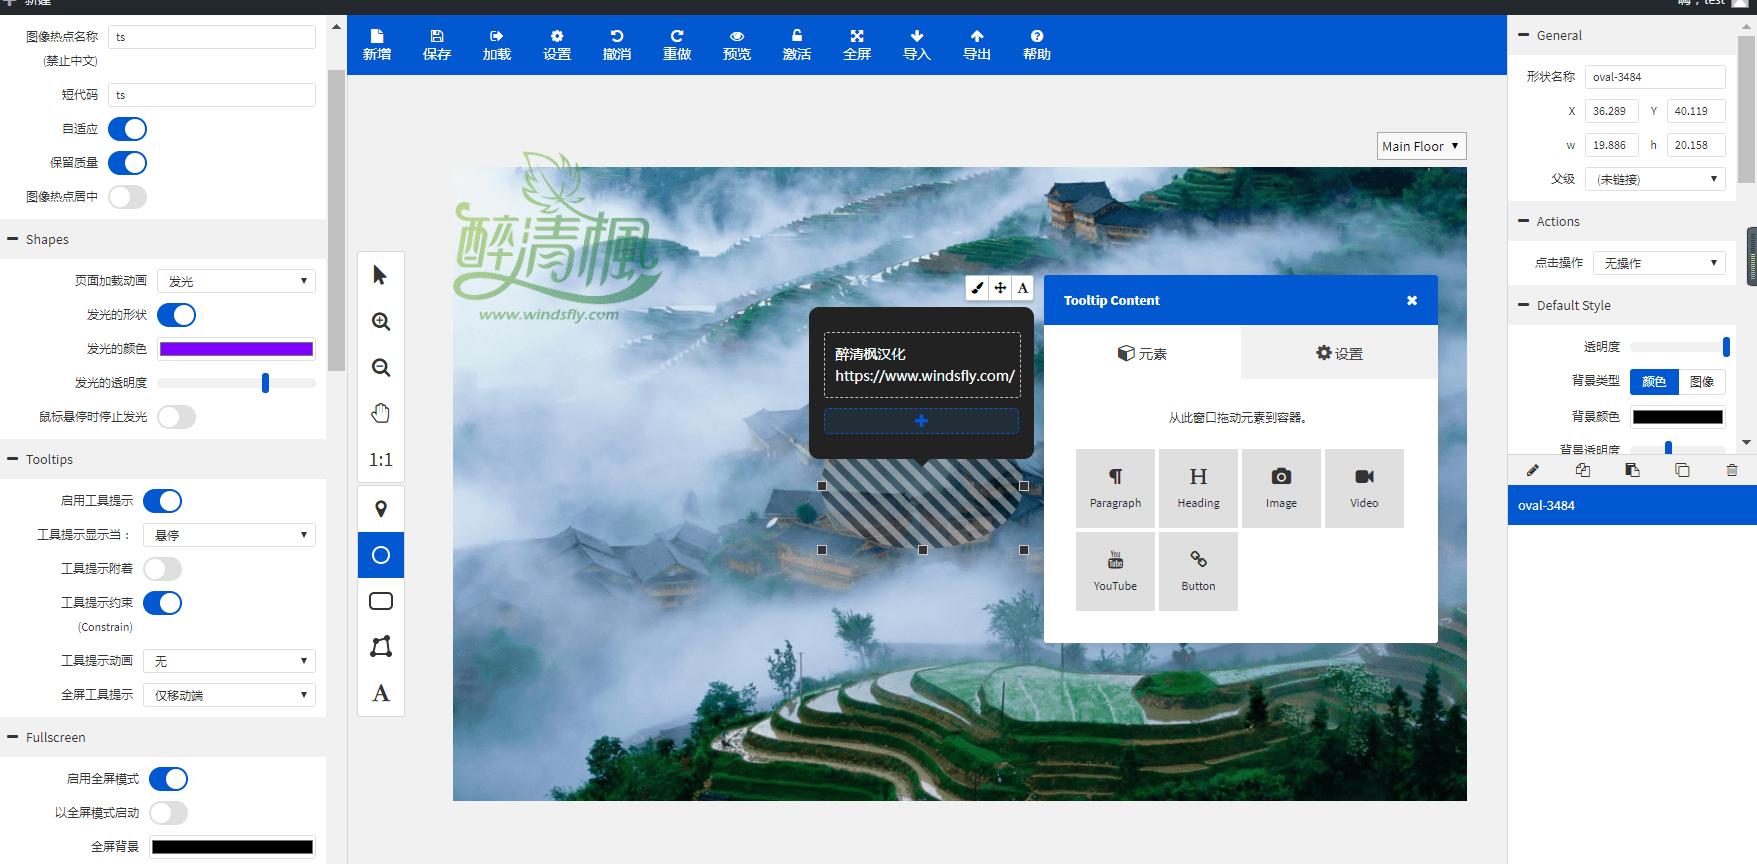 WordPress热点注释插件 - Image Map Pro(汉化)[更新至v5.1.6] WordPress插件 第5张